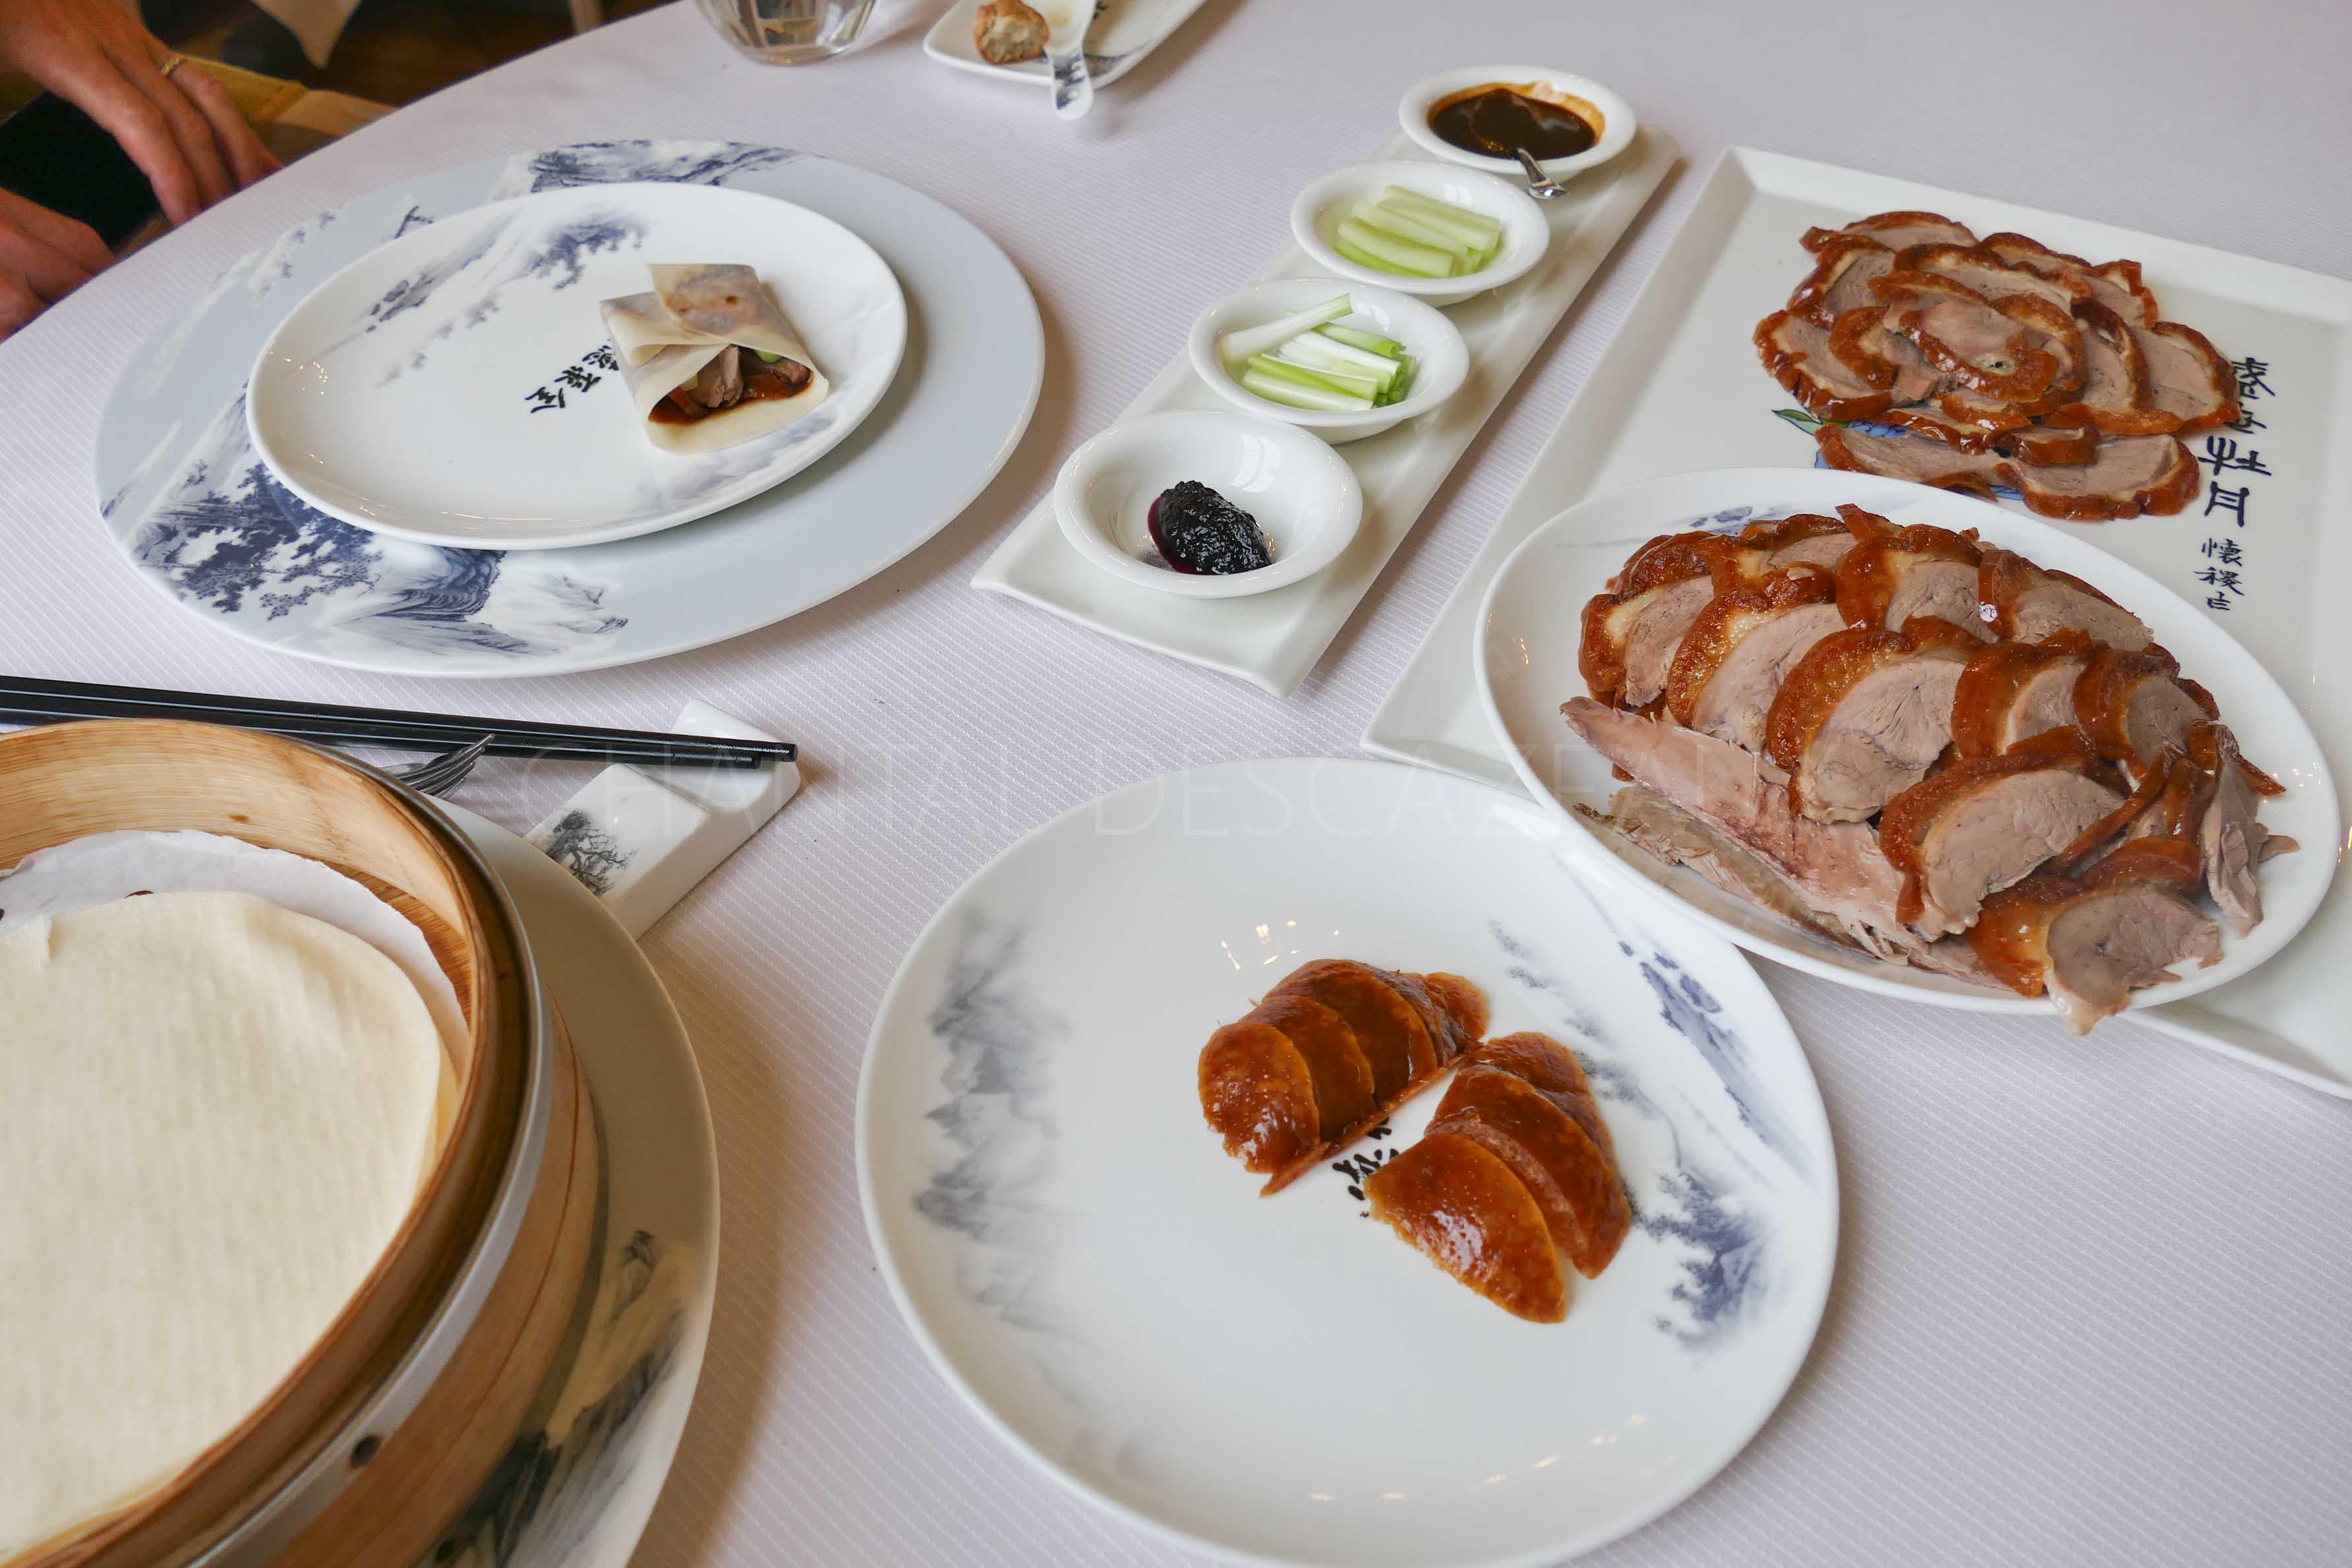 QUANJUDE - L'Art du canard laqué à Bordeaux